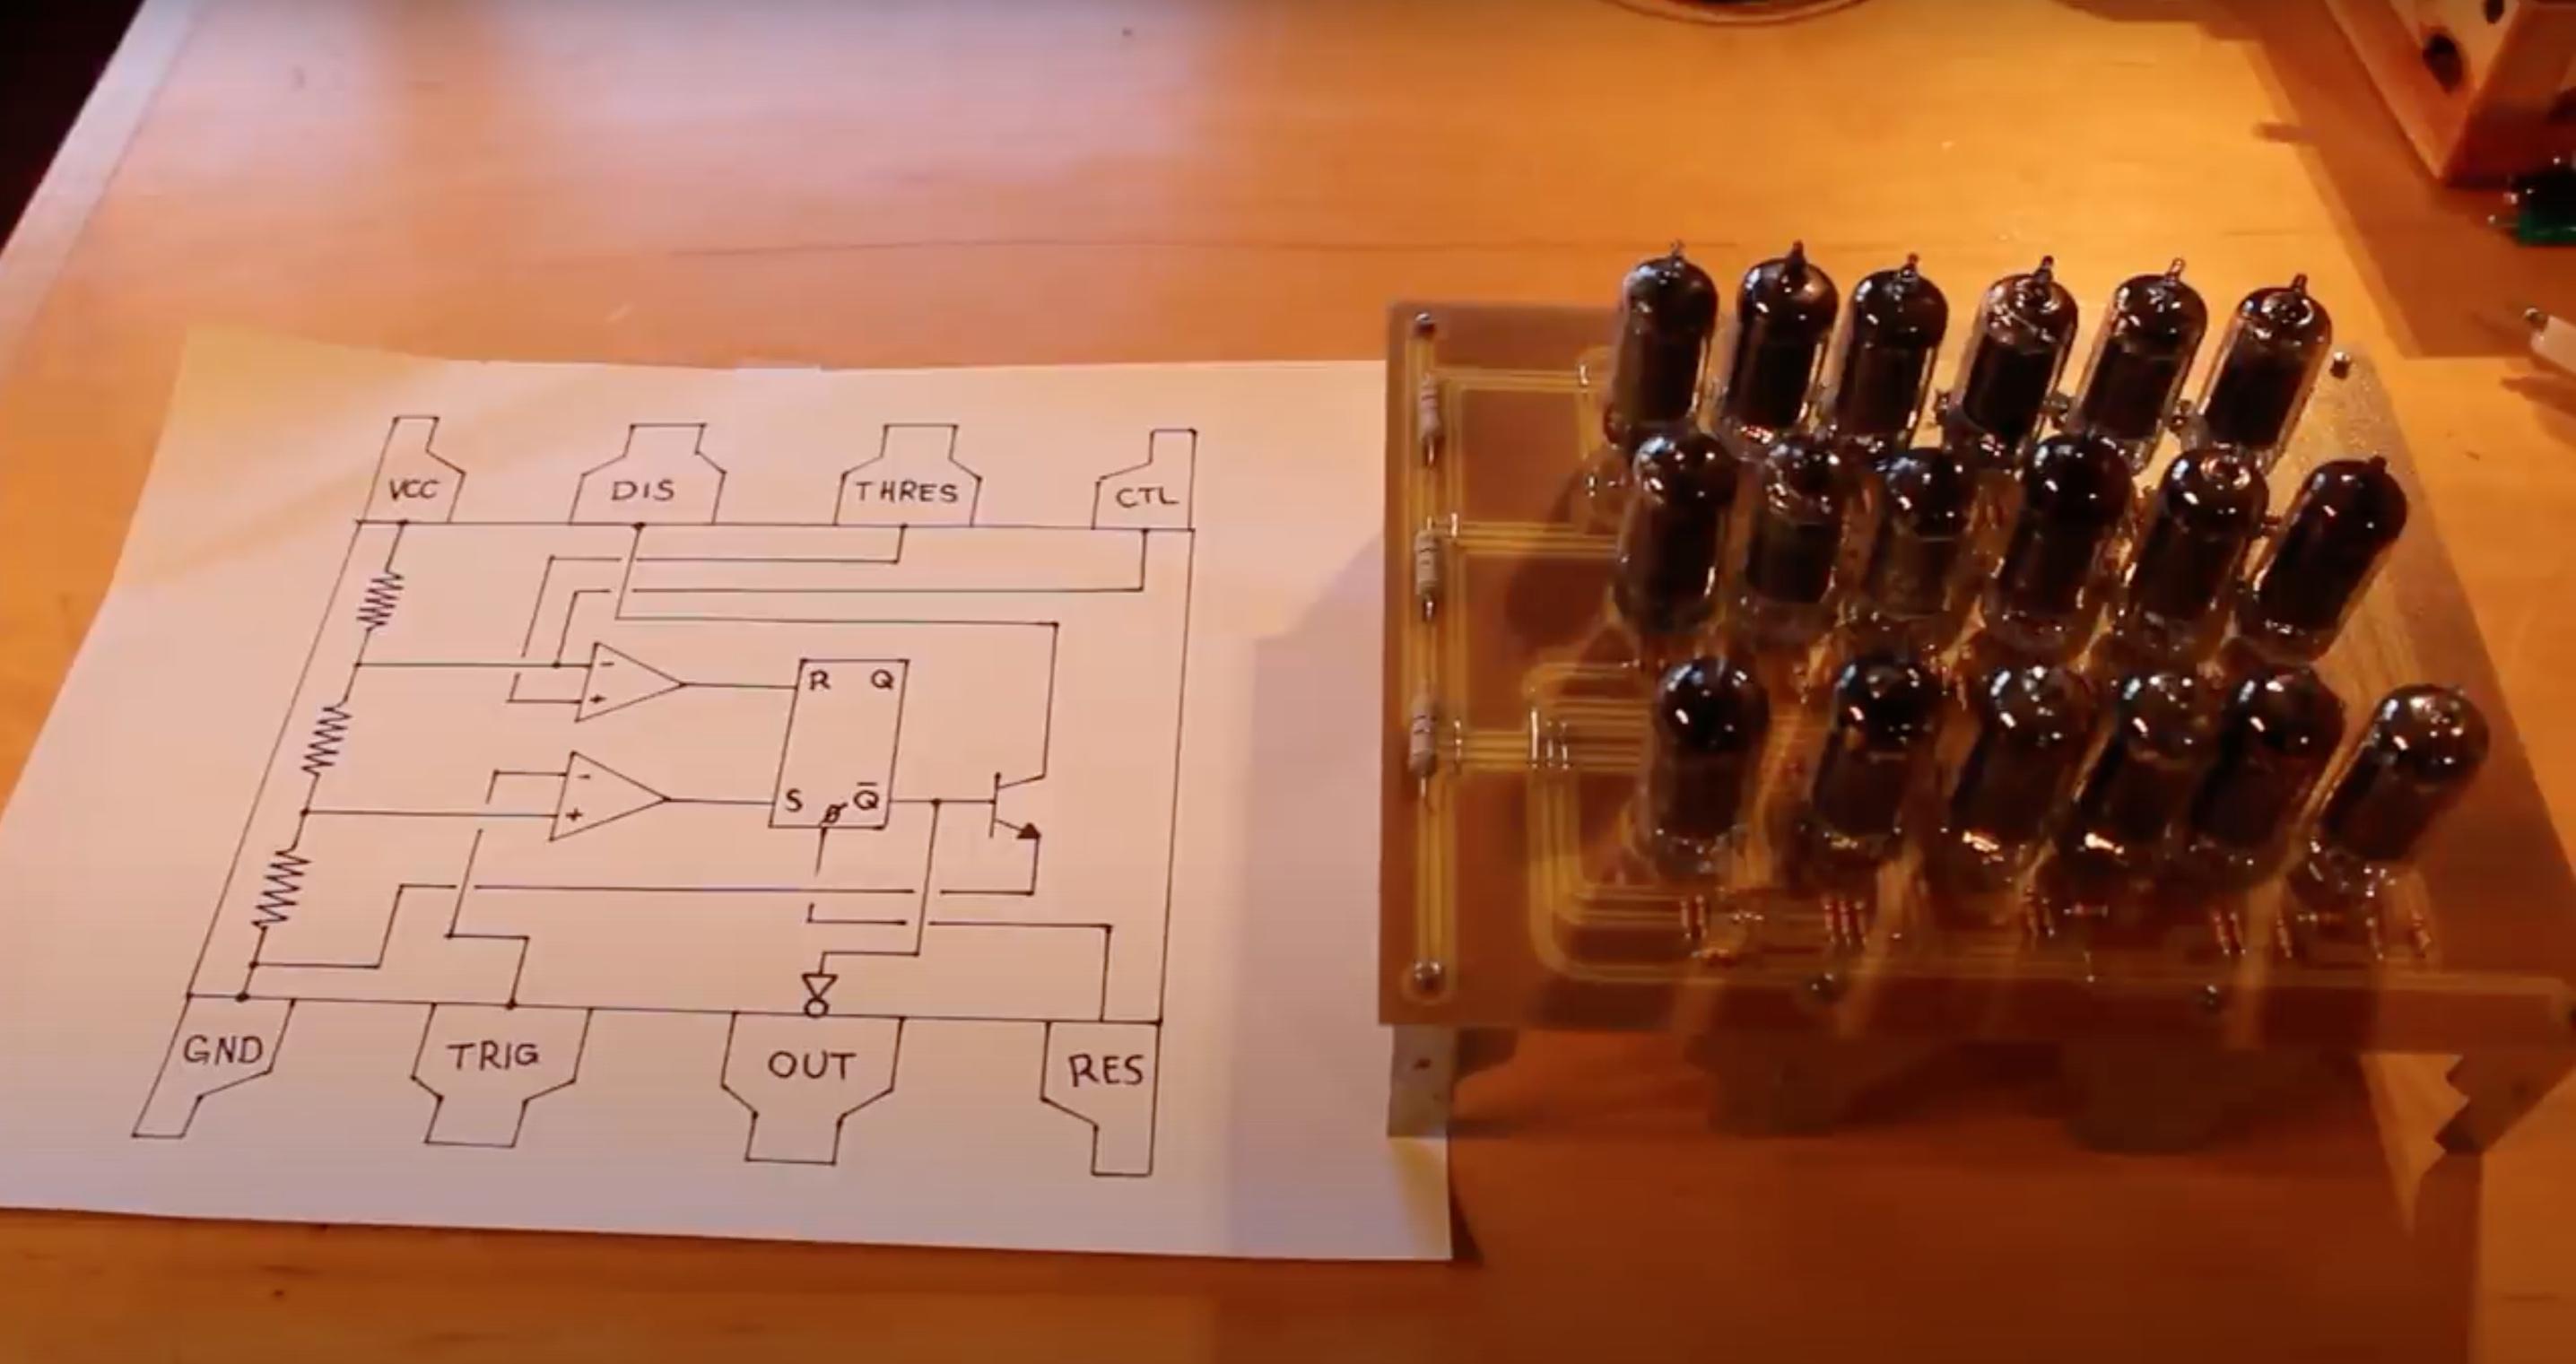 555 diagram next to 555 built of tubes